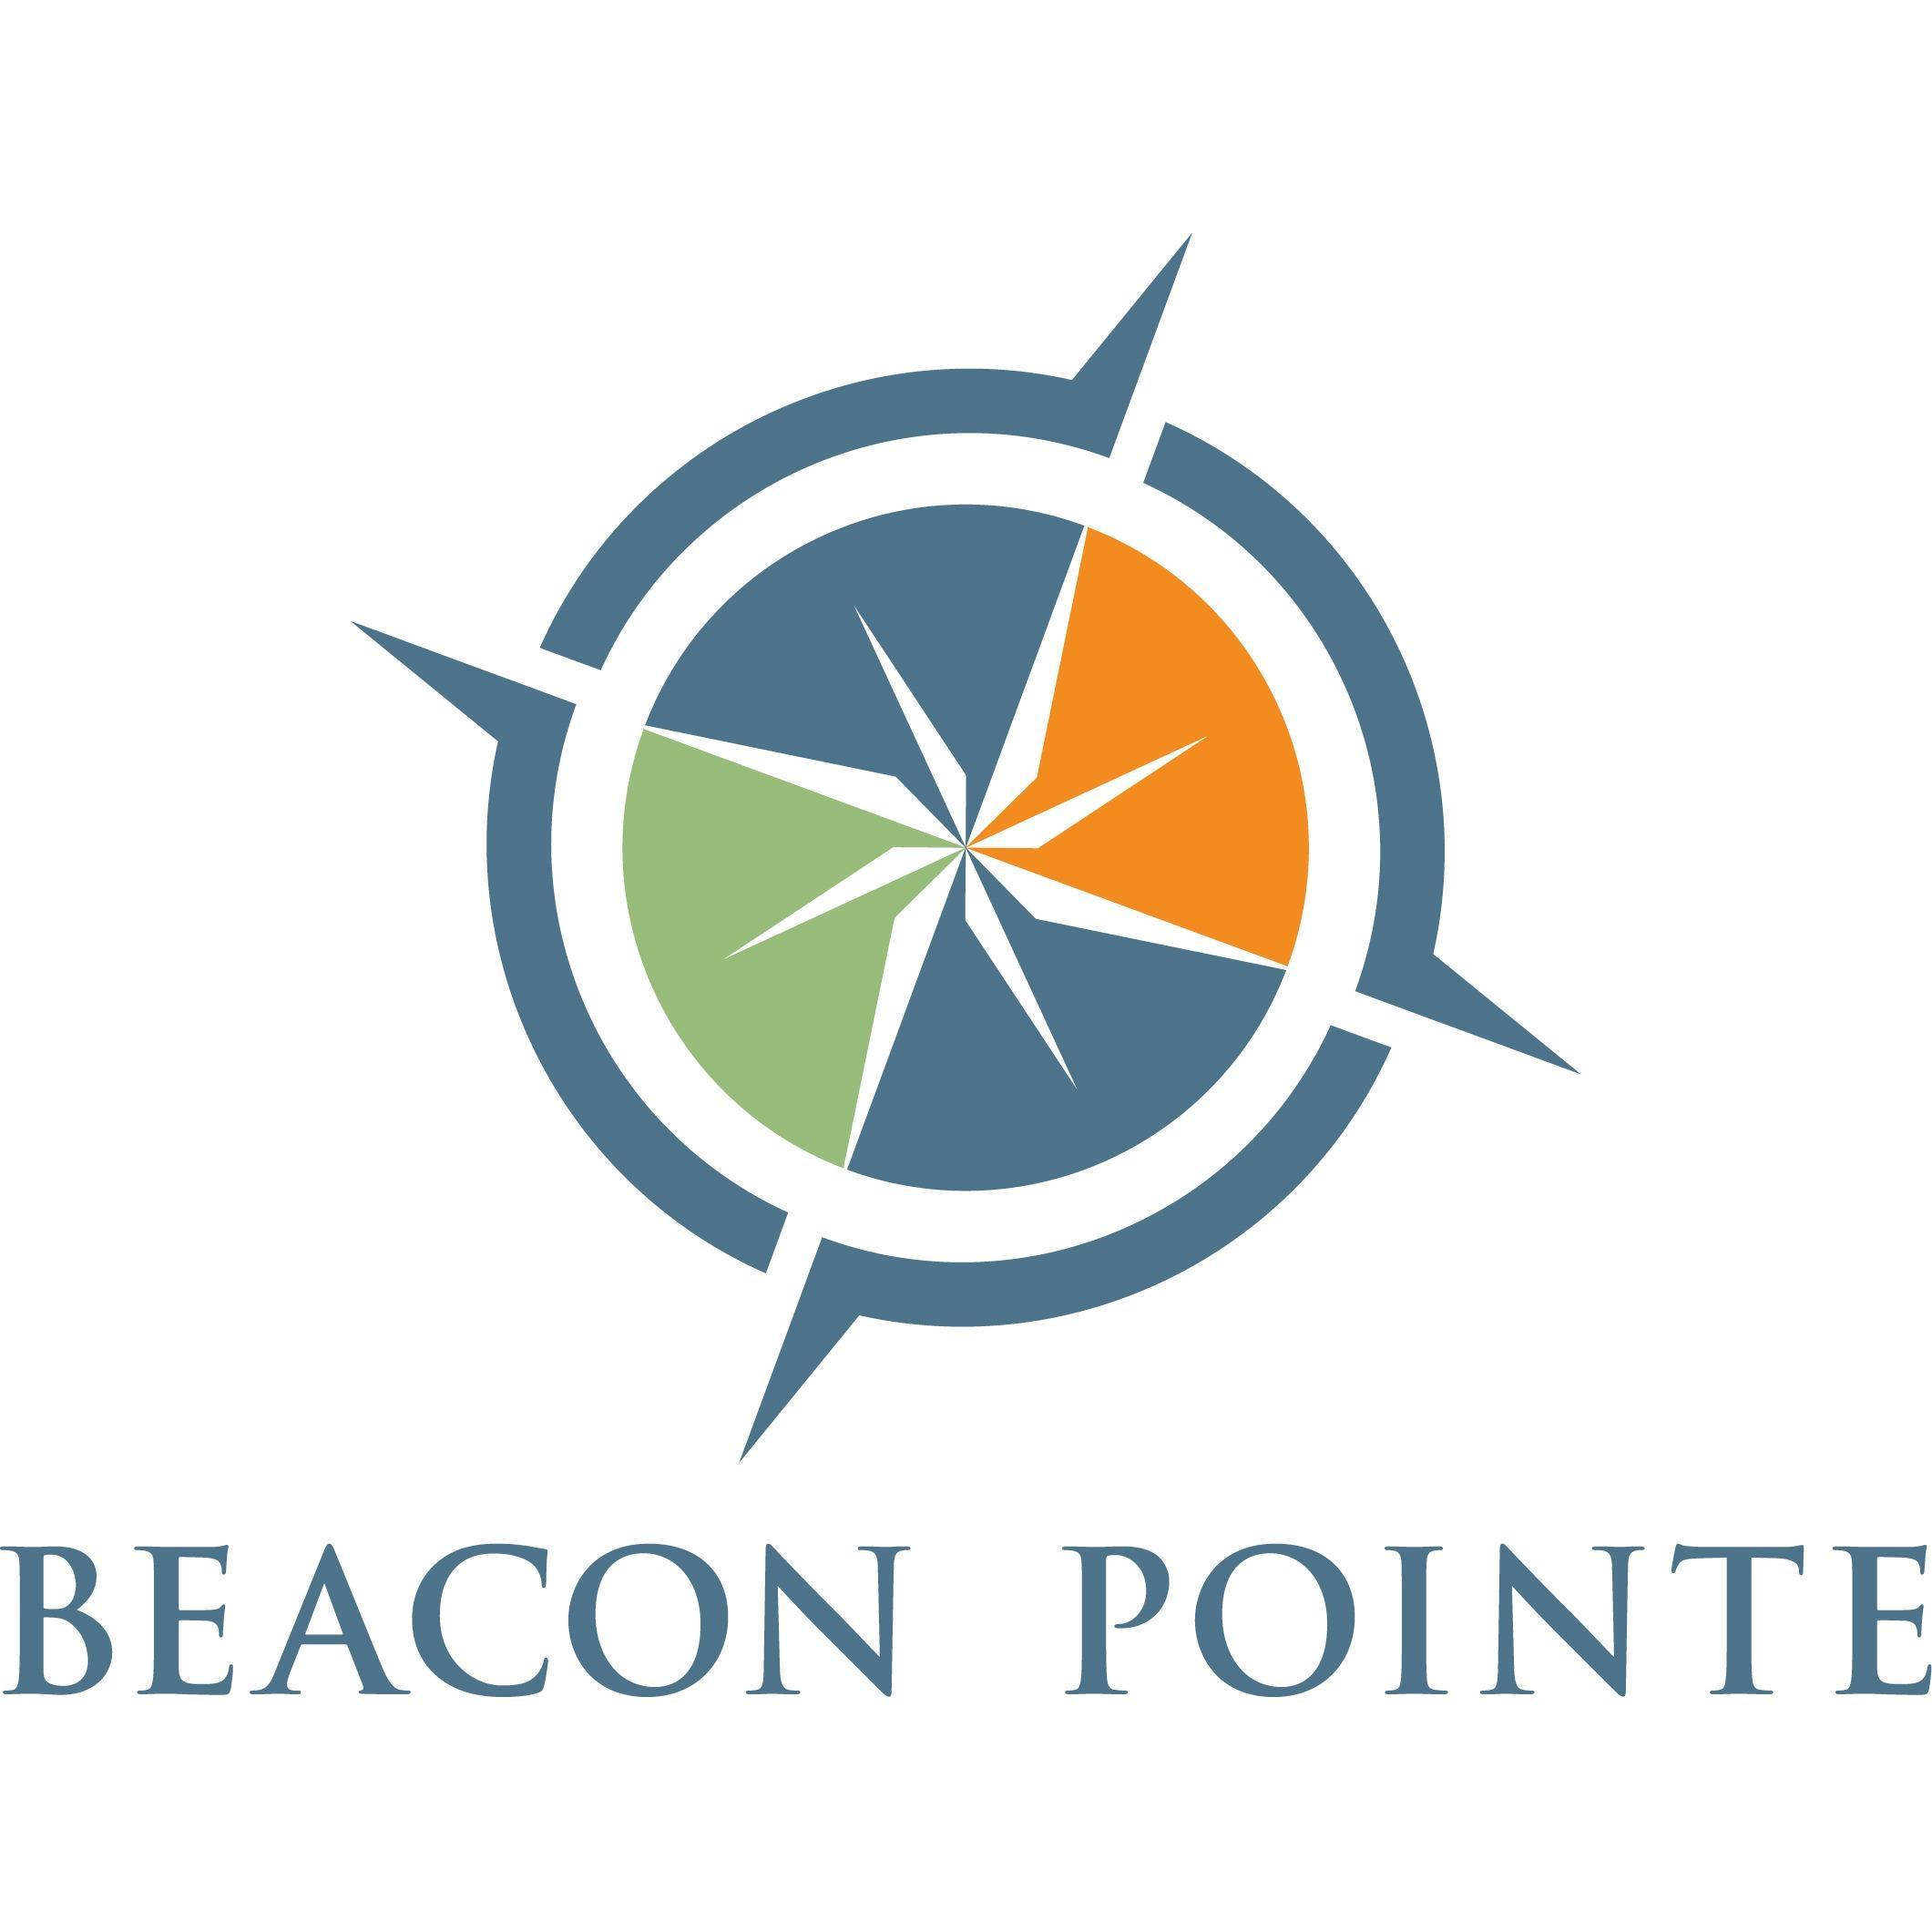 Beacon Pointe Advisors